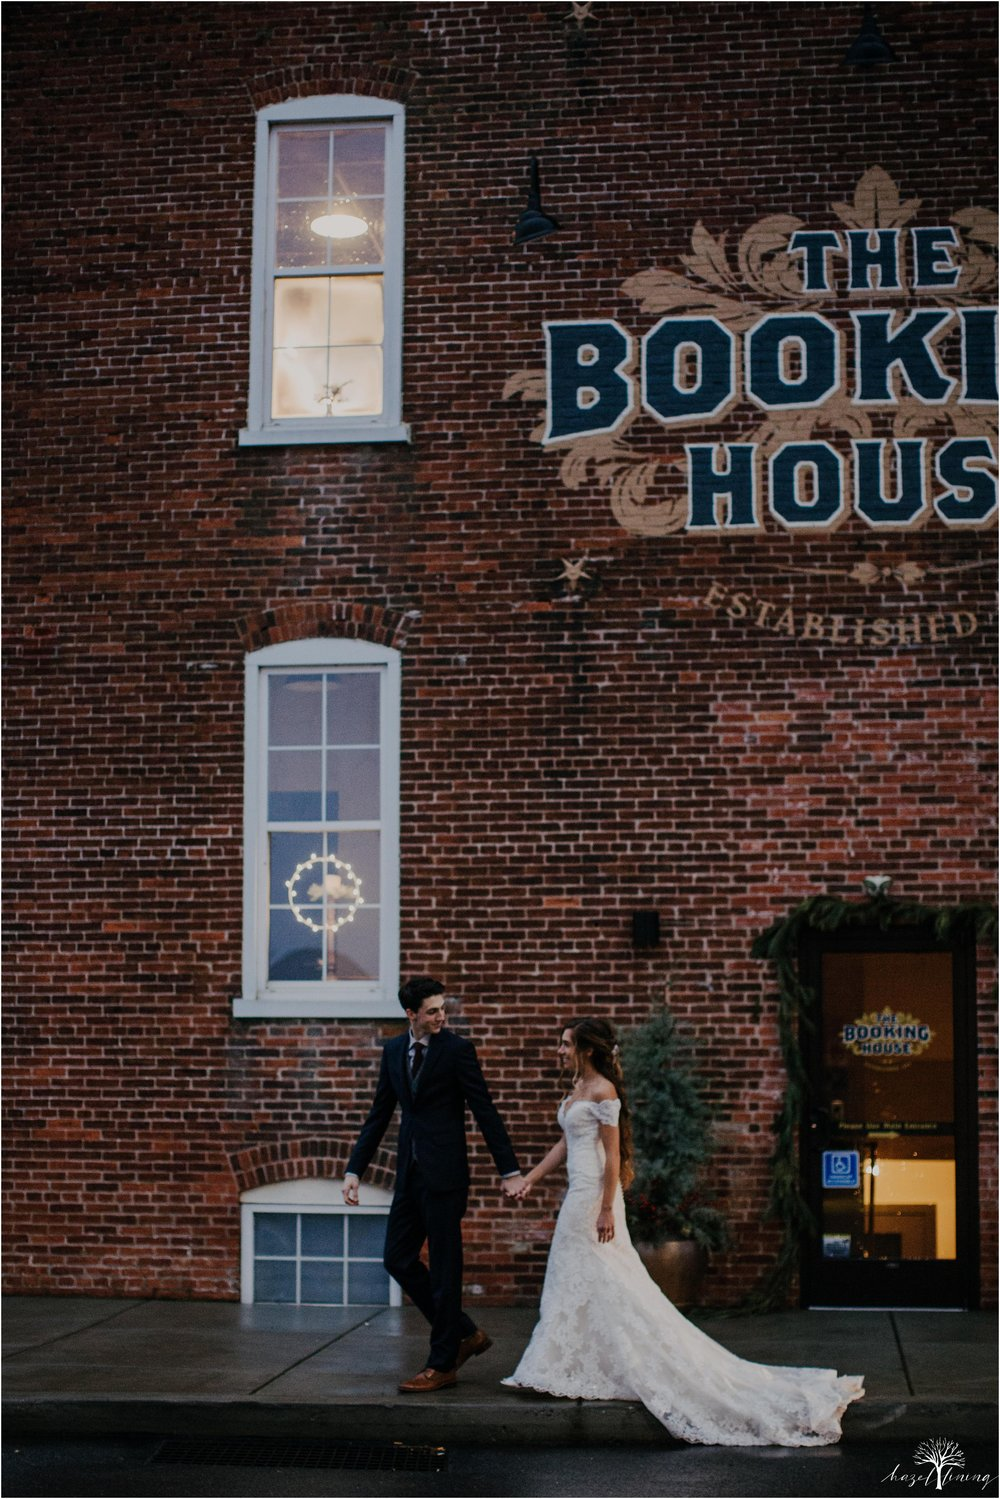 emma-matt-gehringer-the-booking-house-lancaster-manhiem-pennsylvania-winter-wedding_0195.jpg